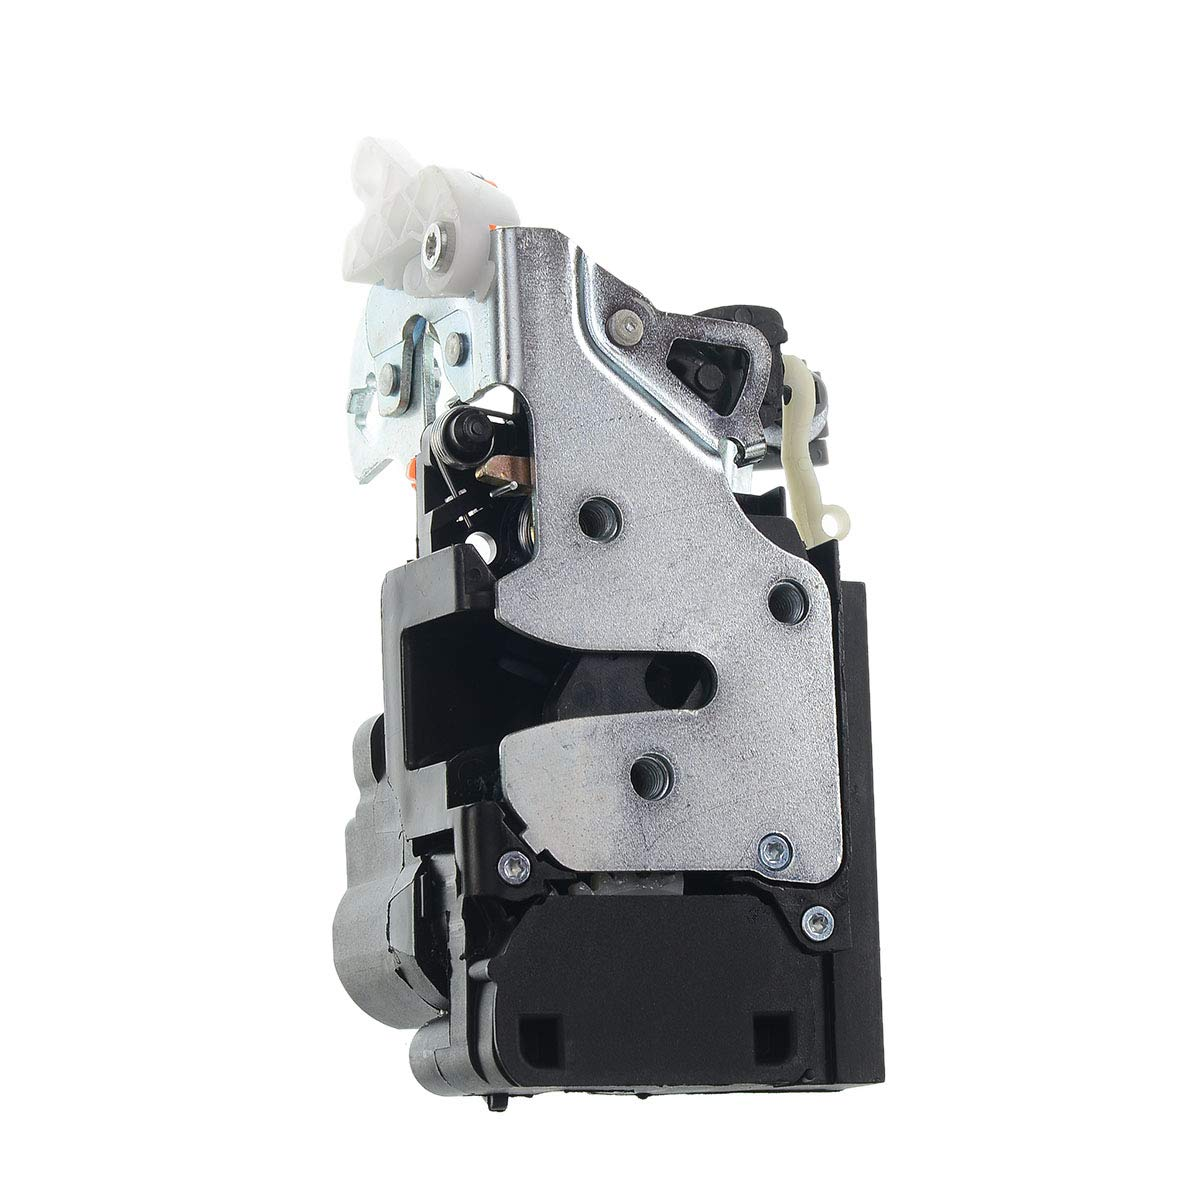 For 2006 Chevrolet Trailblazer l6 V8 4.2 5.3 6.0 Door Lock Actuator